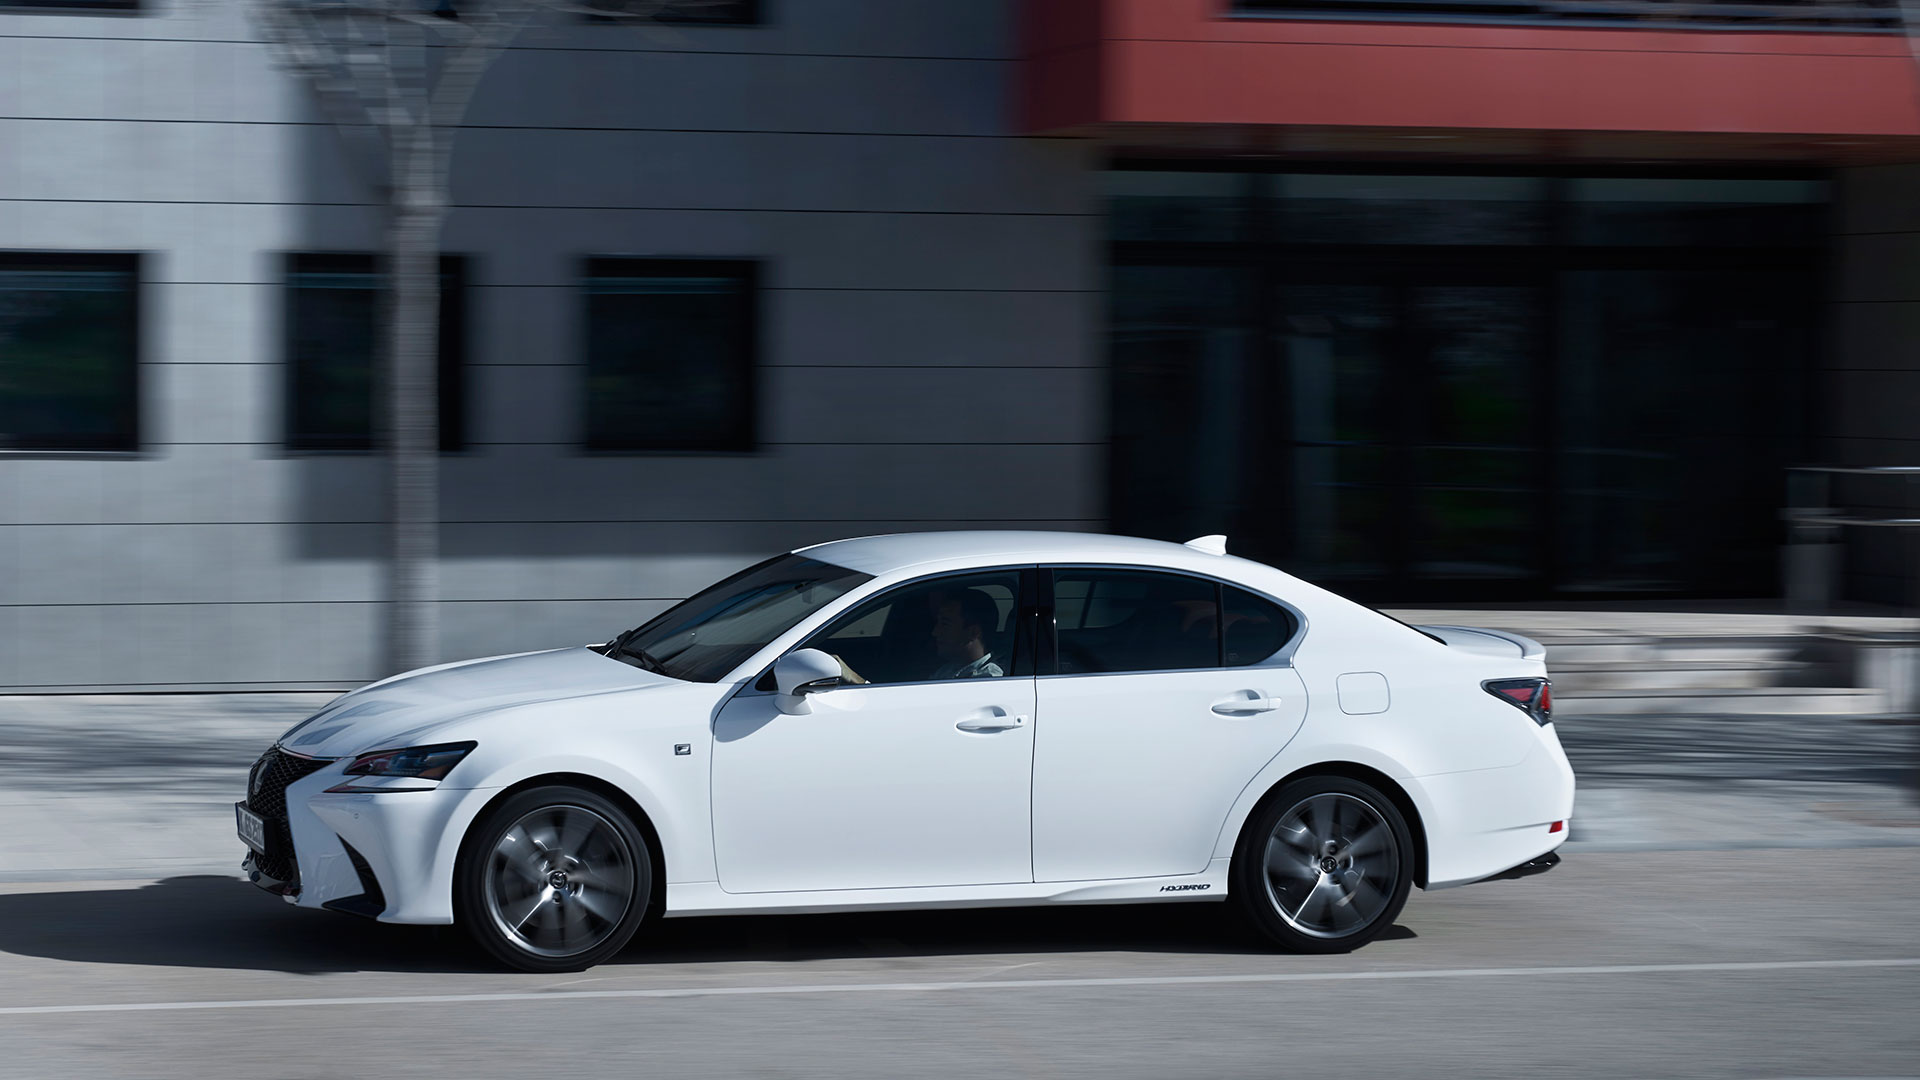 Lexus GS 450H eficiente hero asset